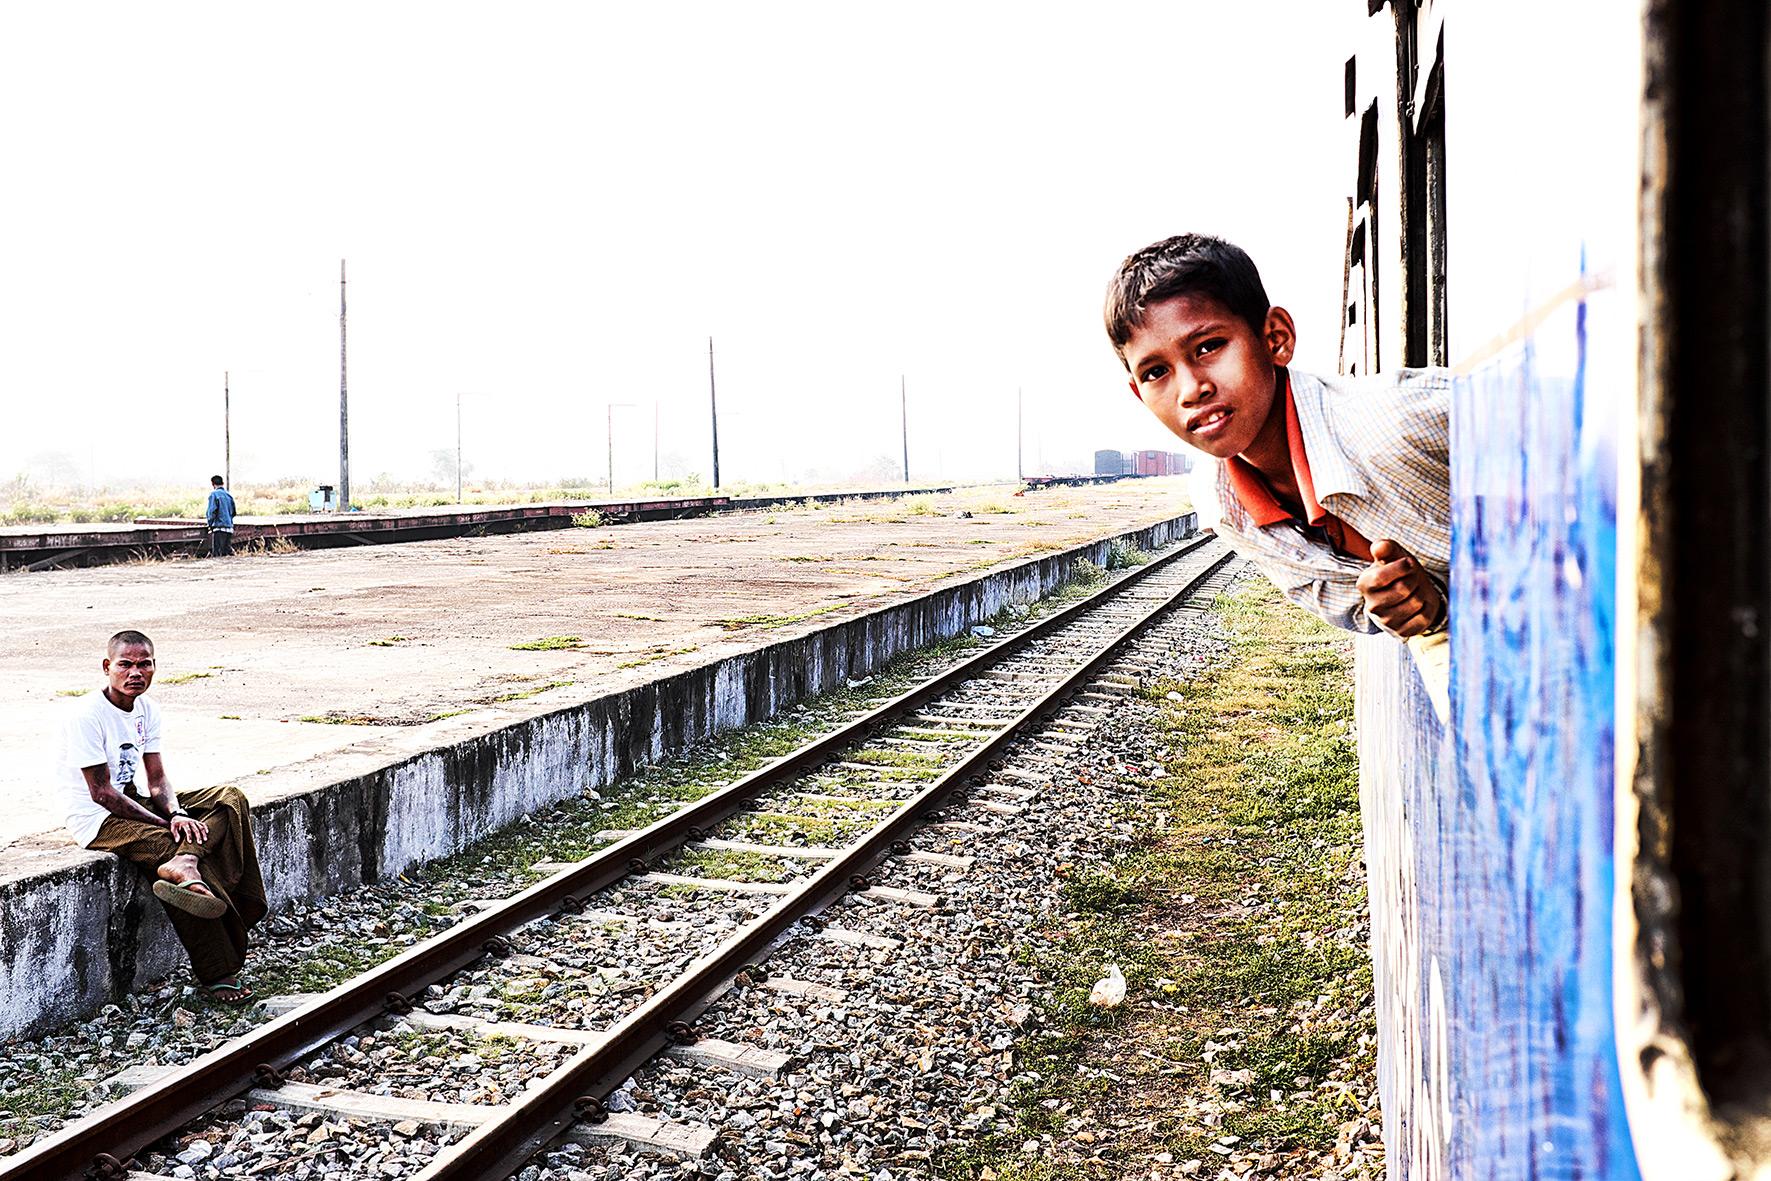 #en train 12. Myanmar. 2015